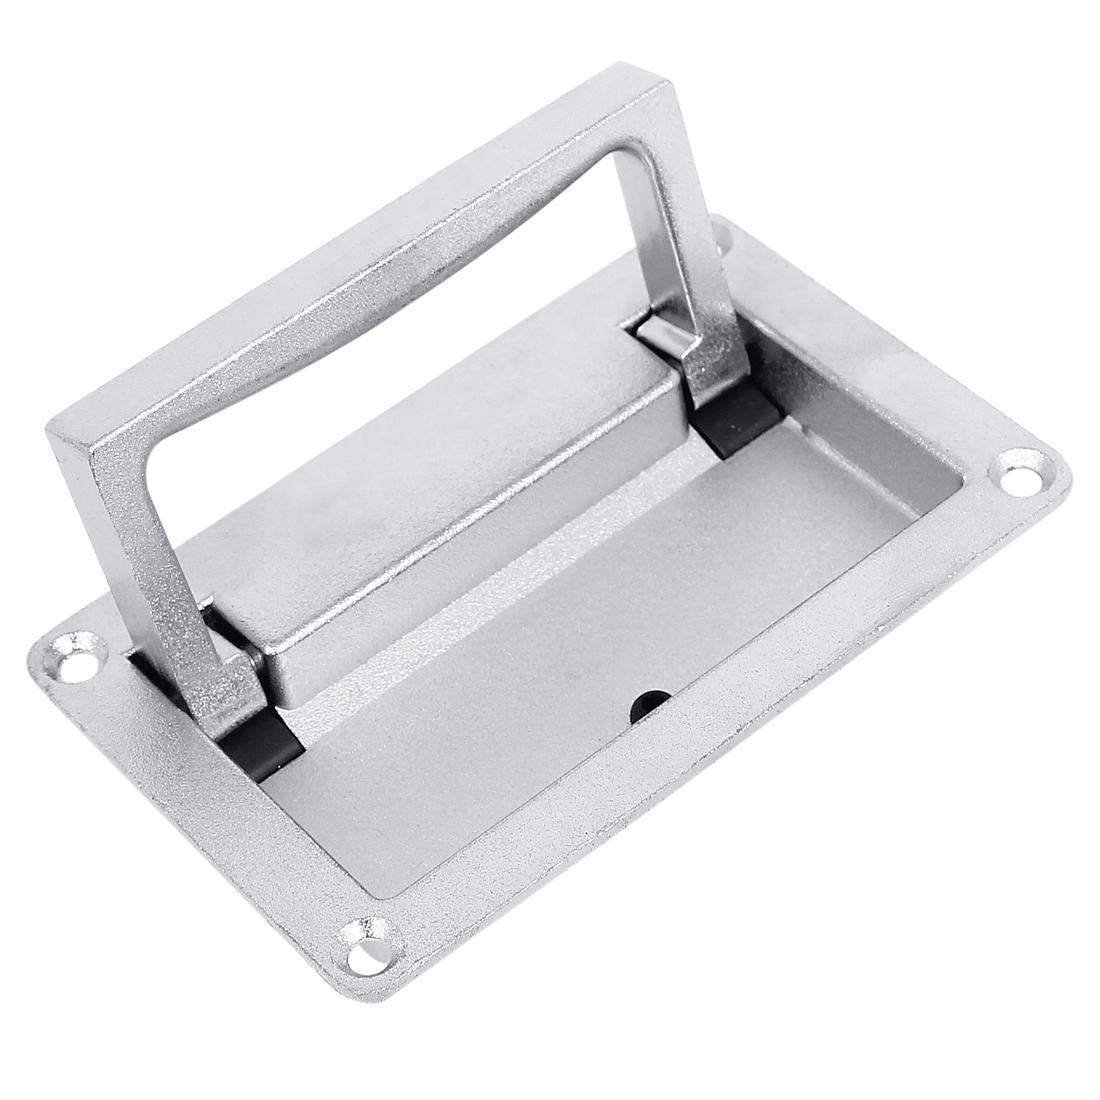 Furniture Cupboard Cabinet Door Rectangular Recessed Foldable Pull Handle 11x7cm